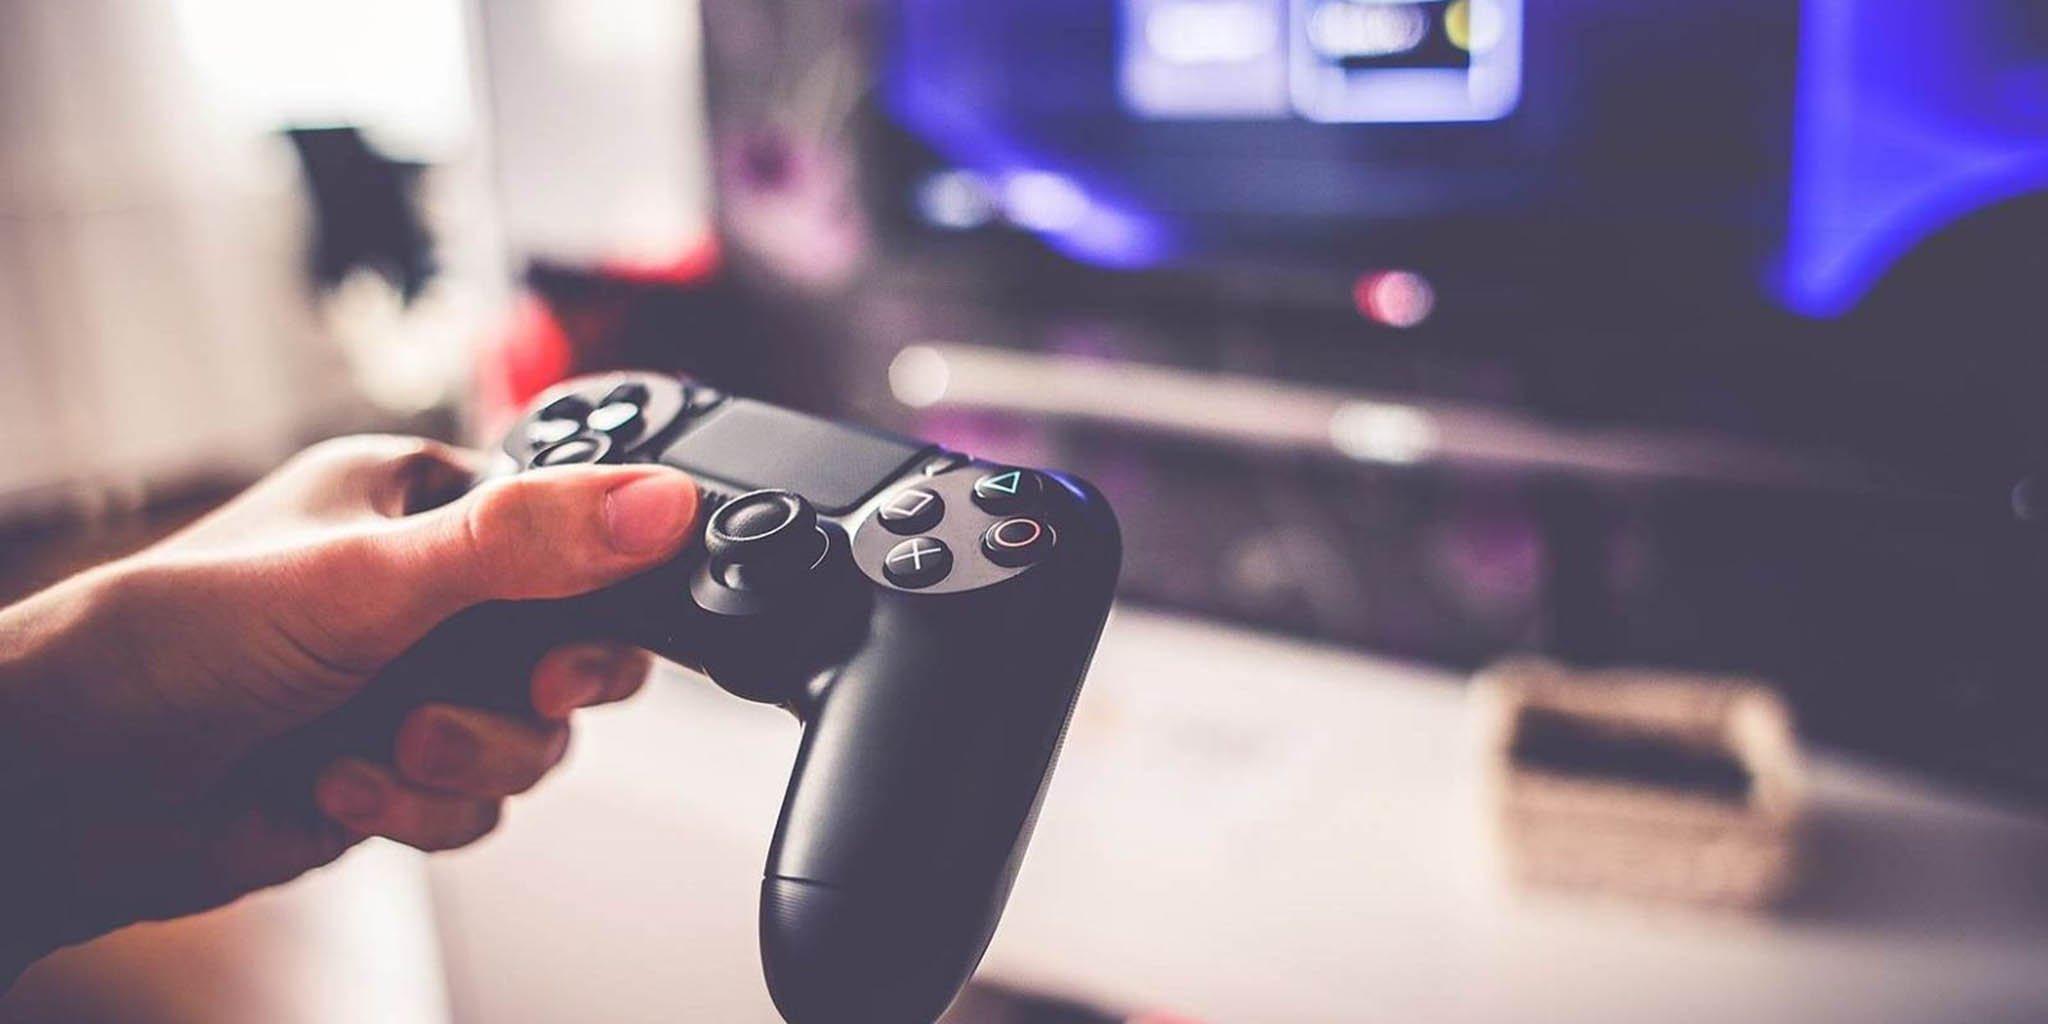 Tay cầm Dualshock 4 của Máy chơi game Playstation PS4 Pro 1TB SONY CUH-7218B OM